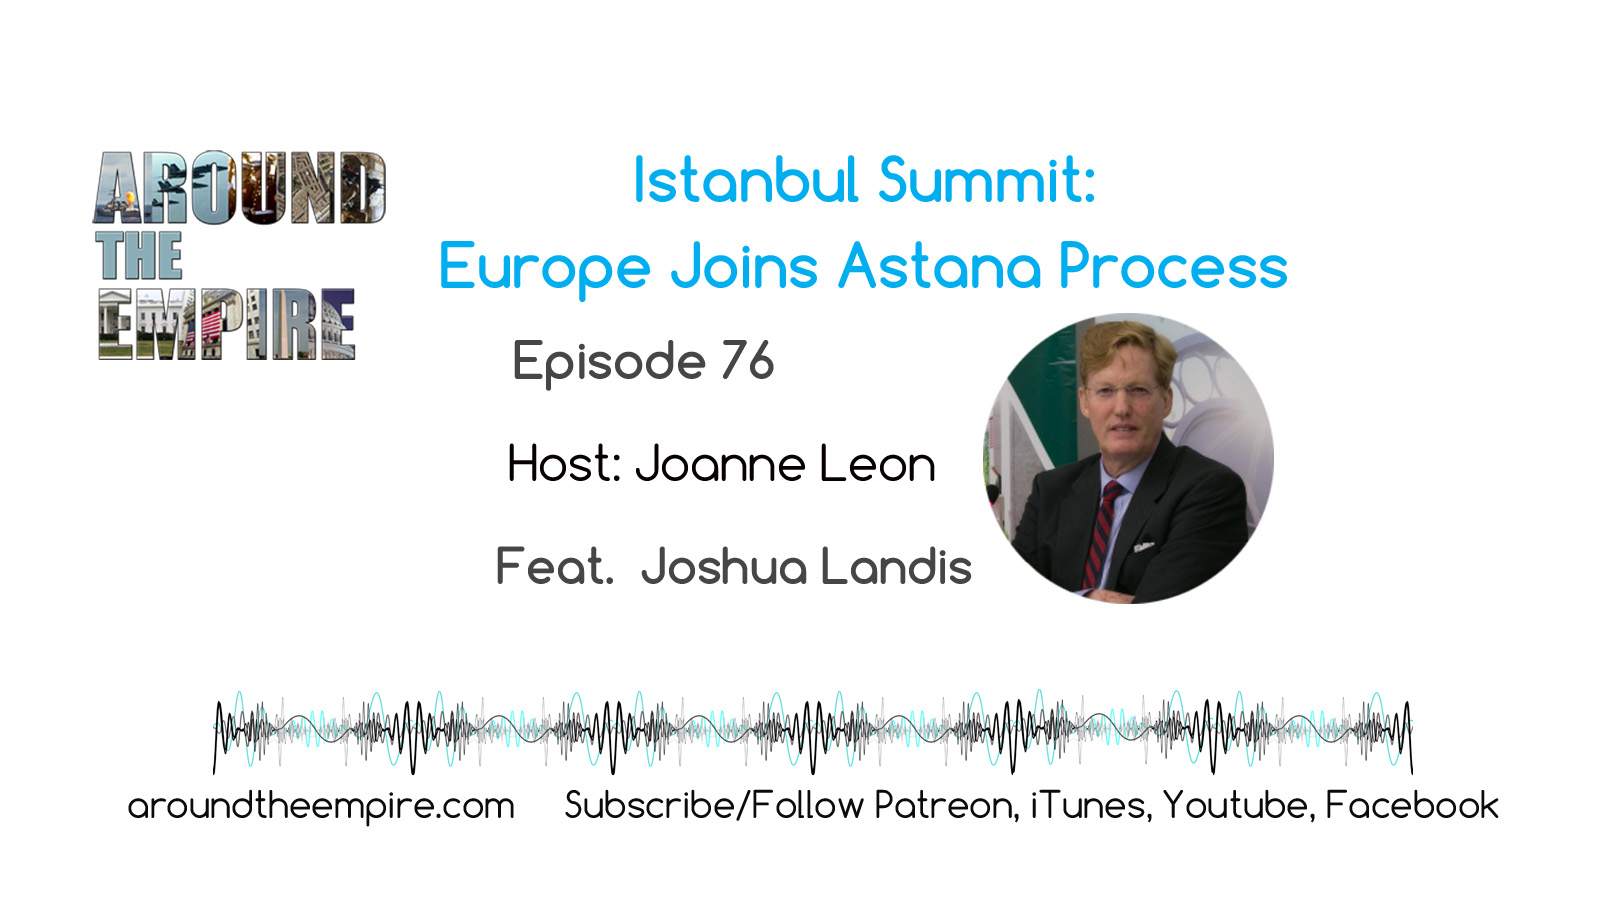 Ep76 Istanbul Summit feat Joshua Landis